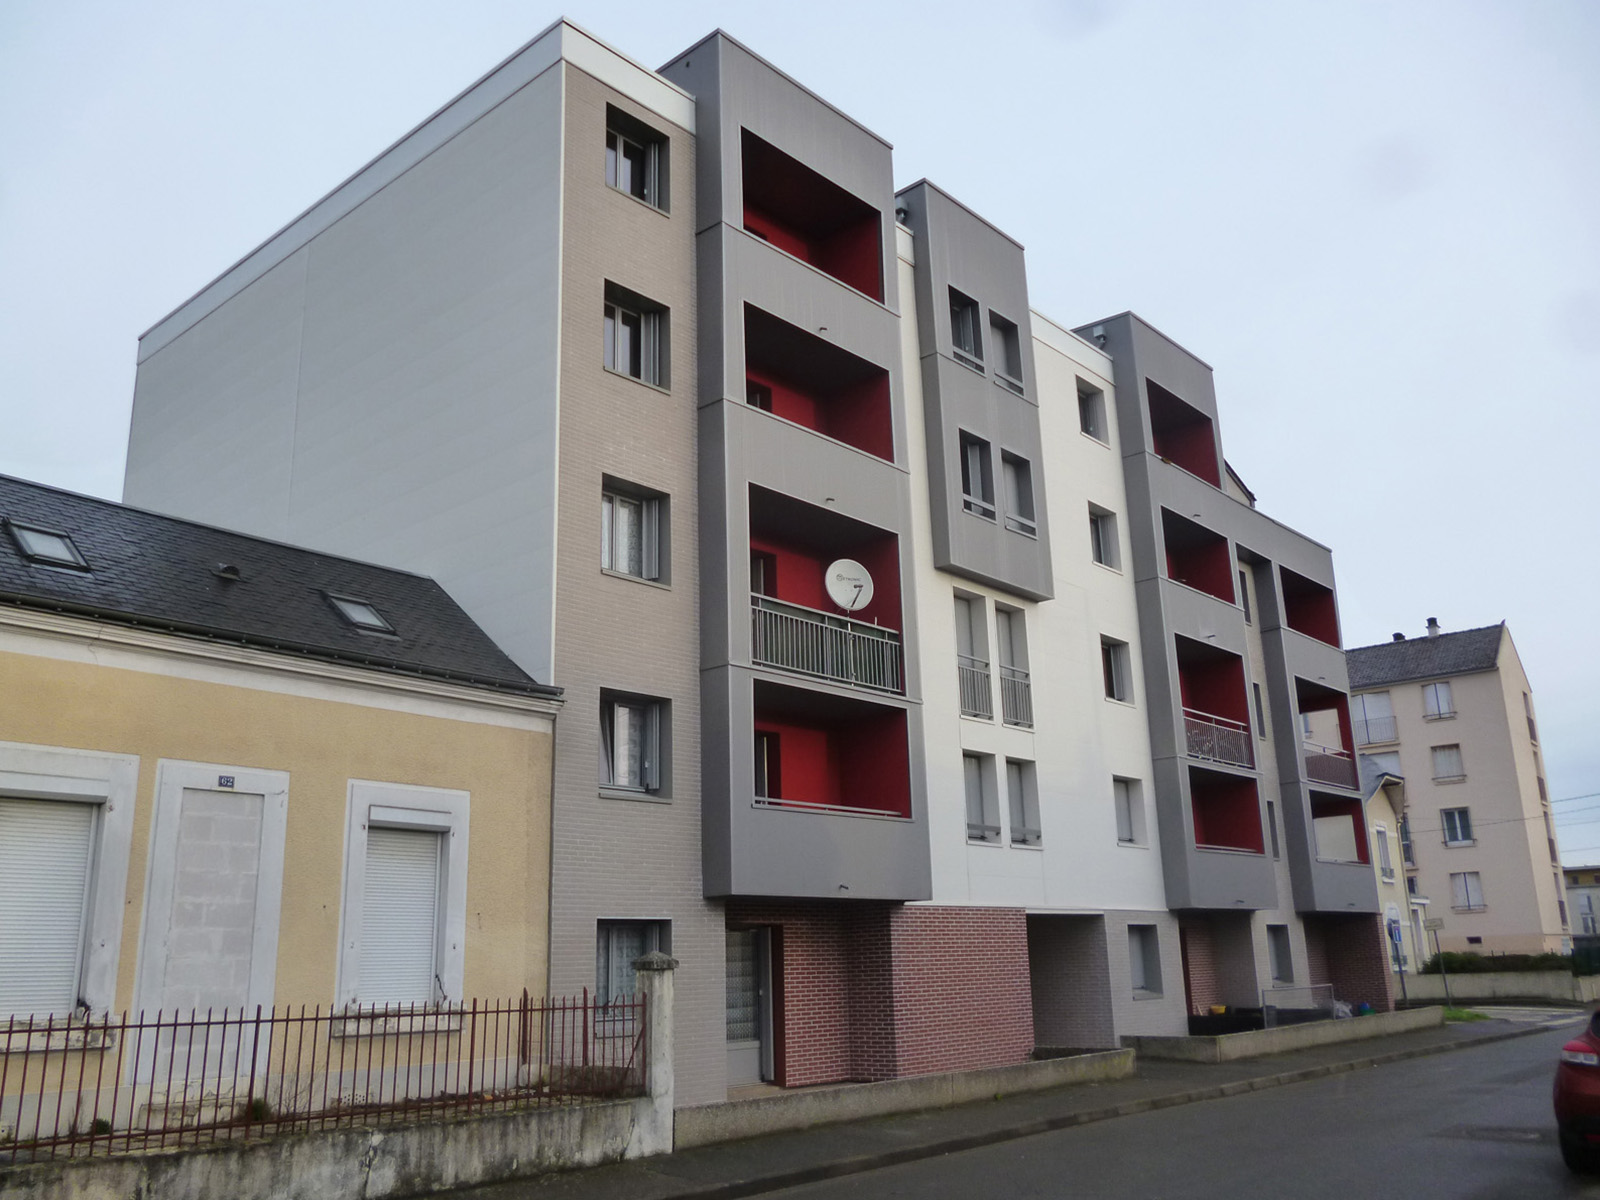 podeliha-rousseau-logements-architectes